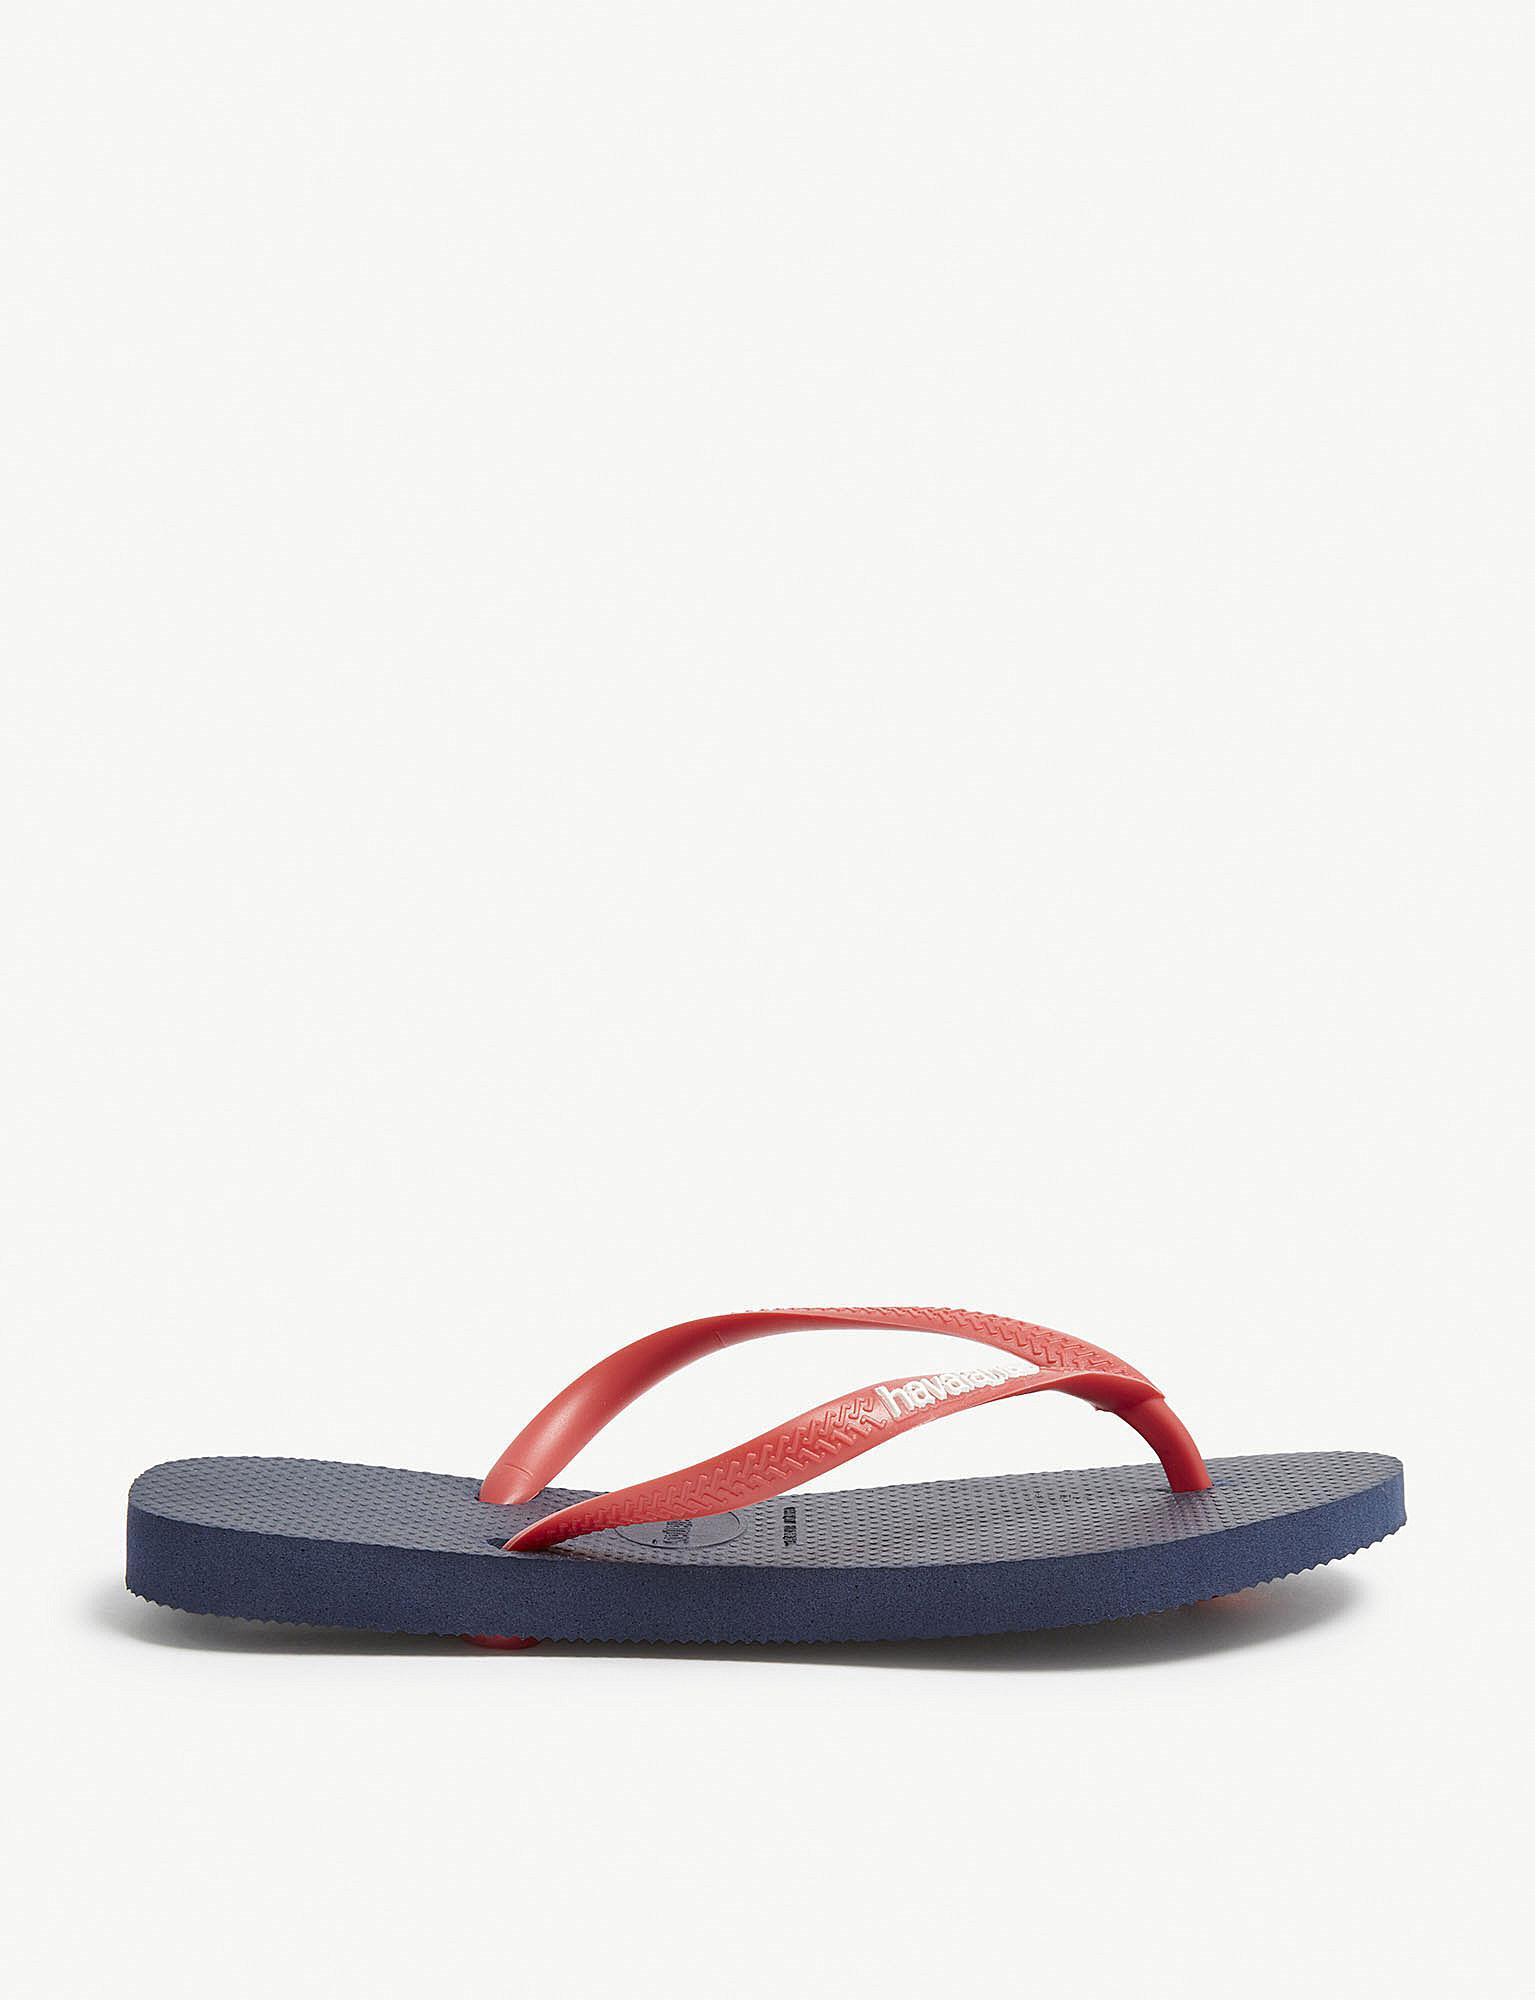 340baa4bff0fc3 Havaianas Slim Rubber Flip-flops in Red - Lyst